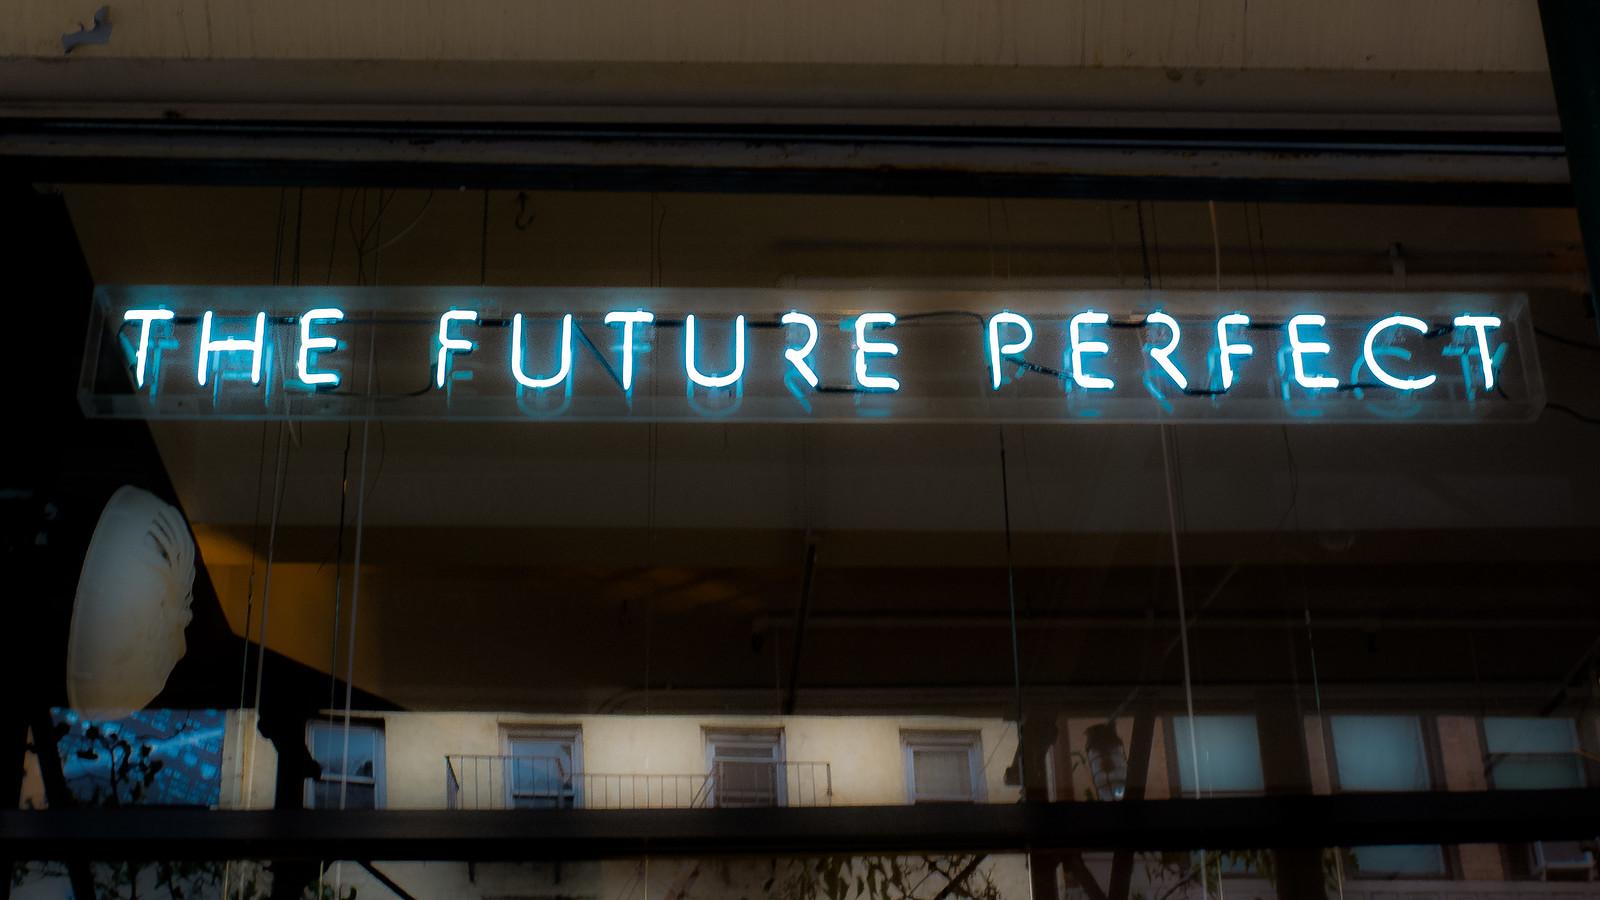 Future Perfect by wwward0